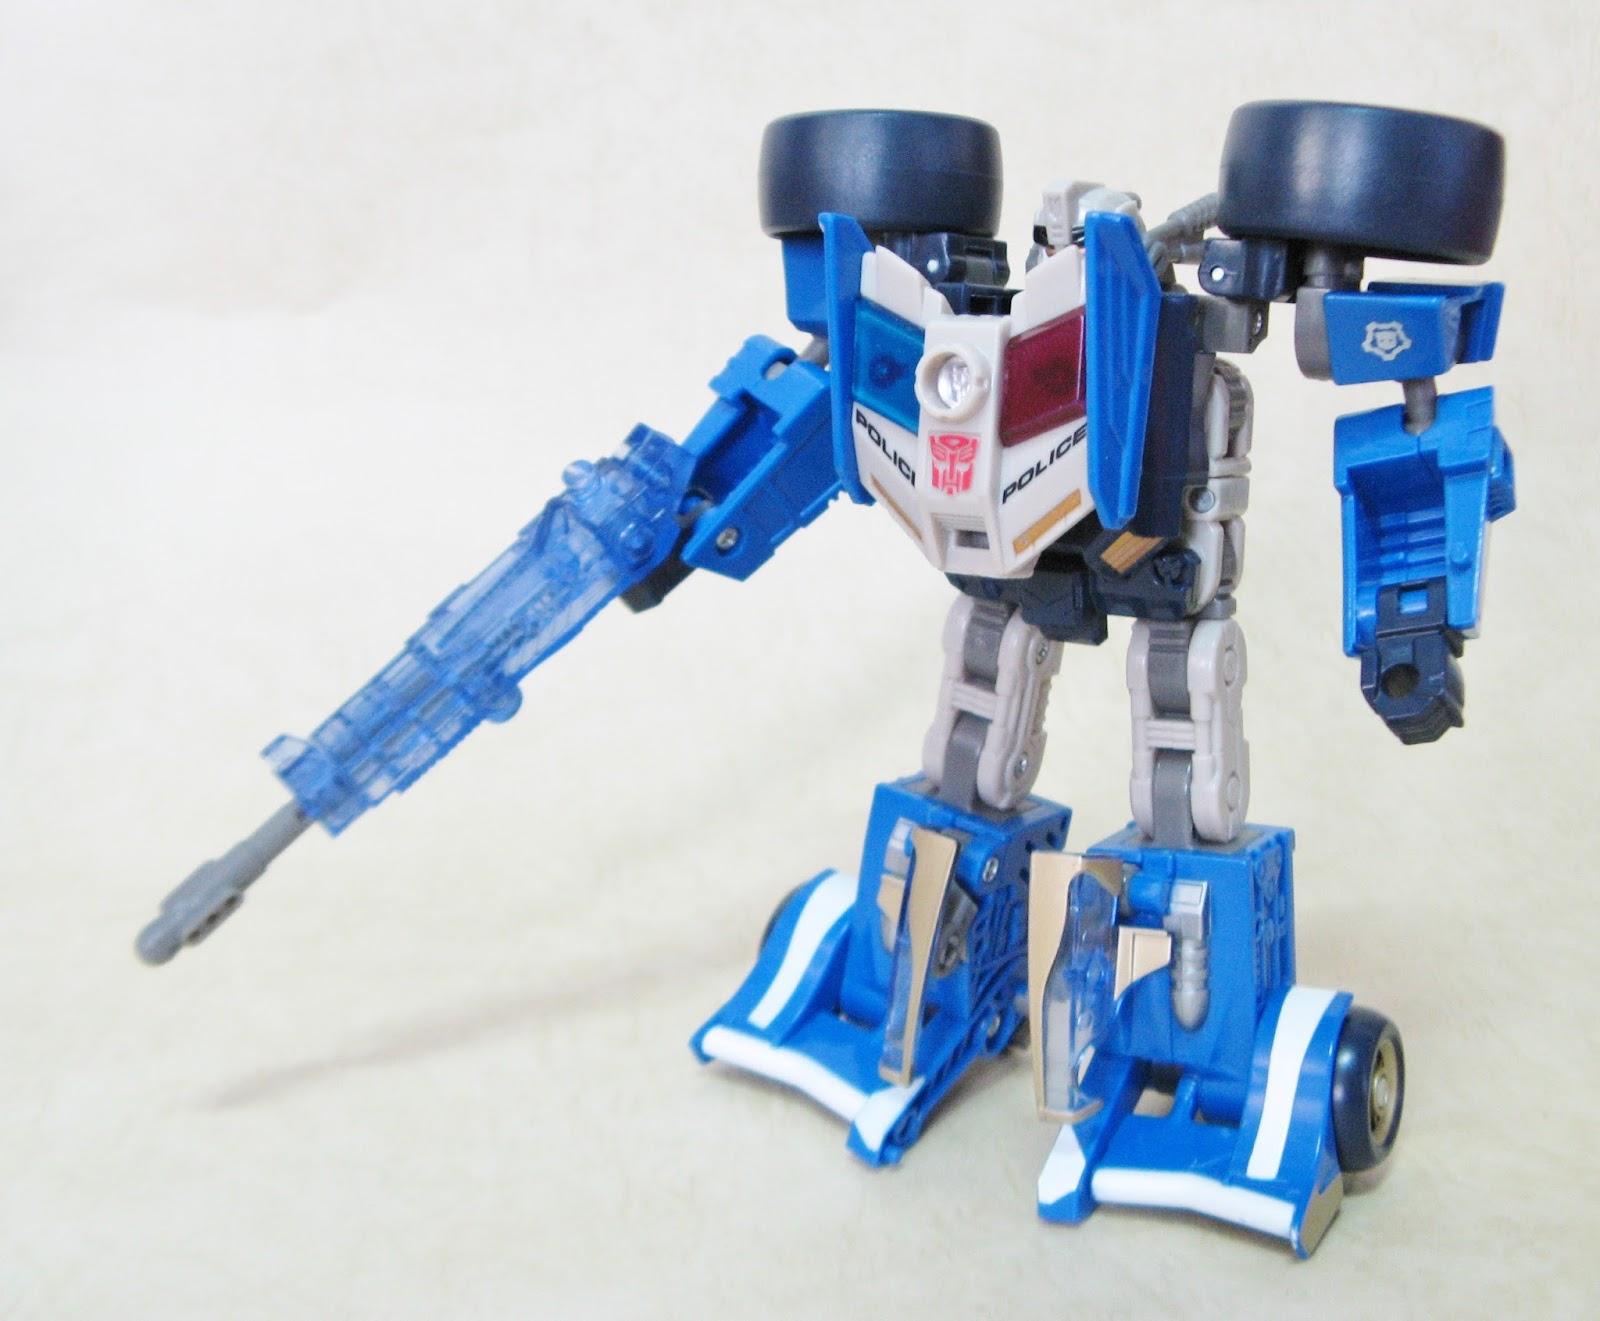 TRANSFORMERS ENERGON Deluxe class Prowl變形金剛能量源之戰豪華級潛行獸